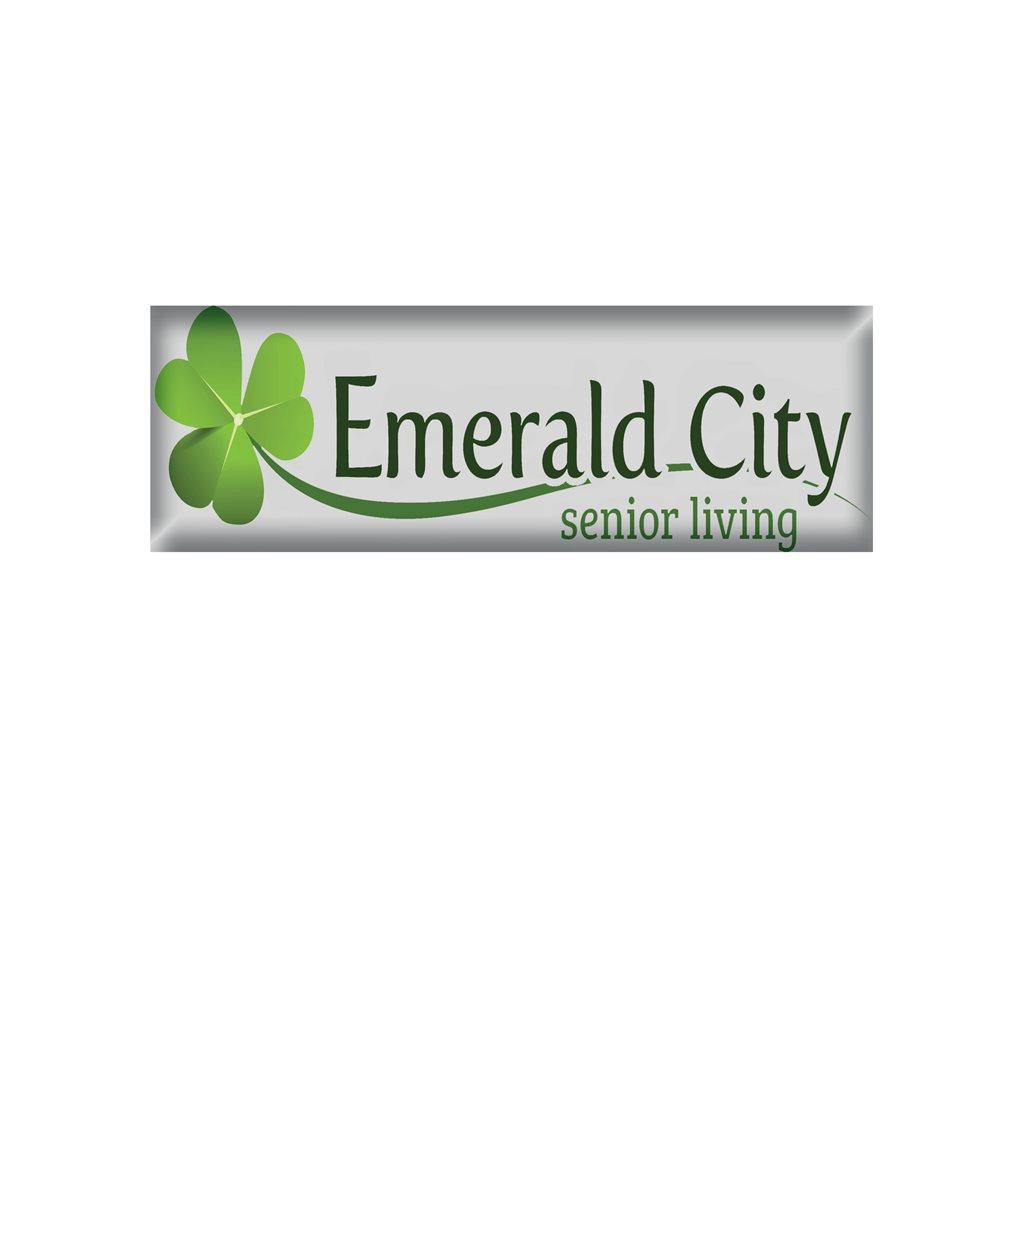 Emerald City Senior Living